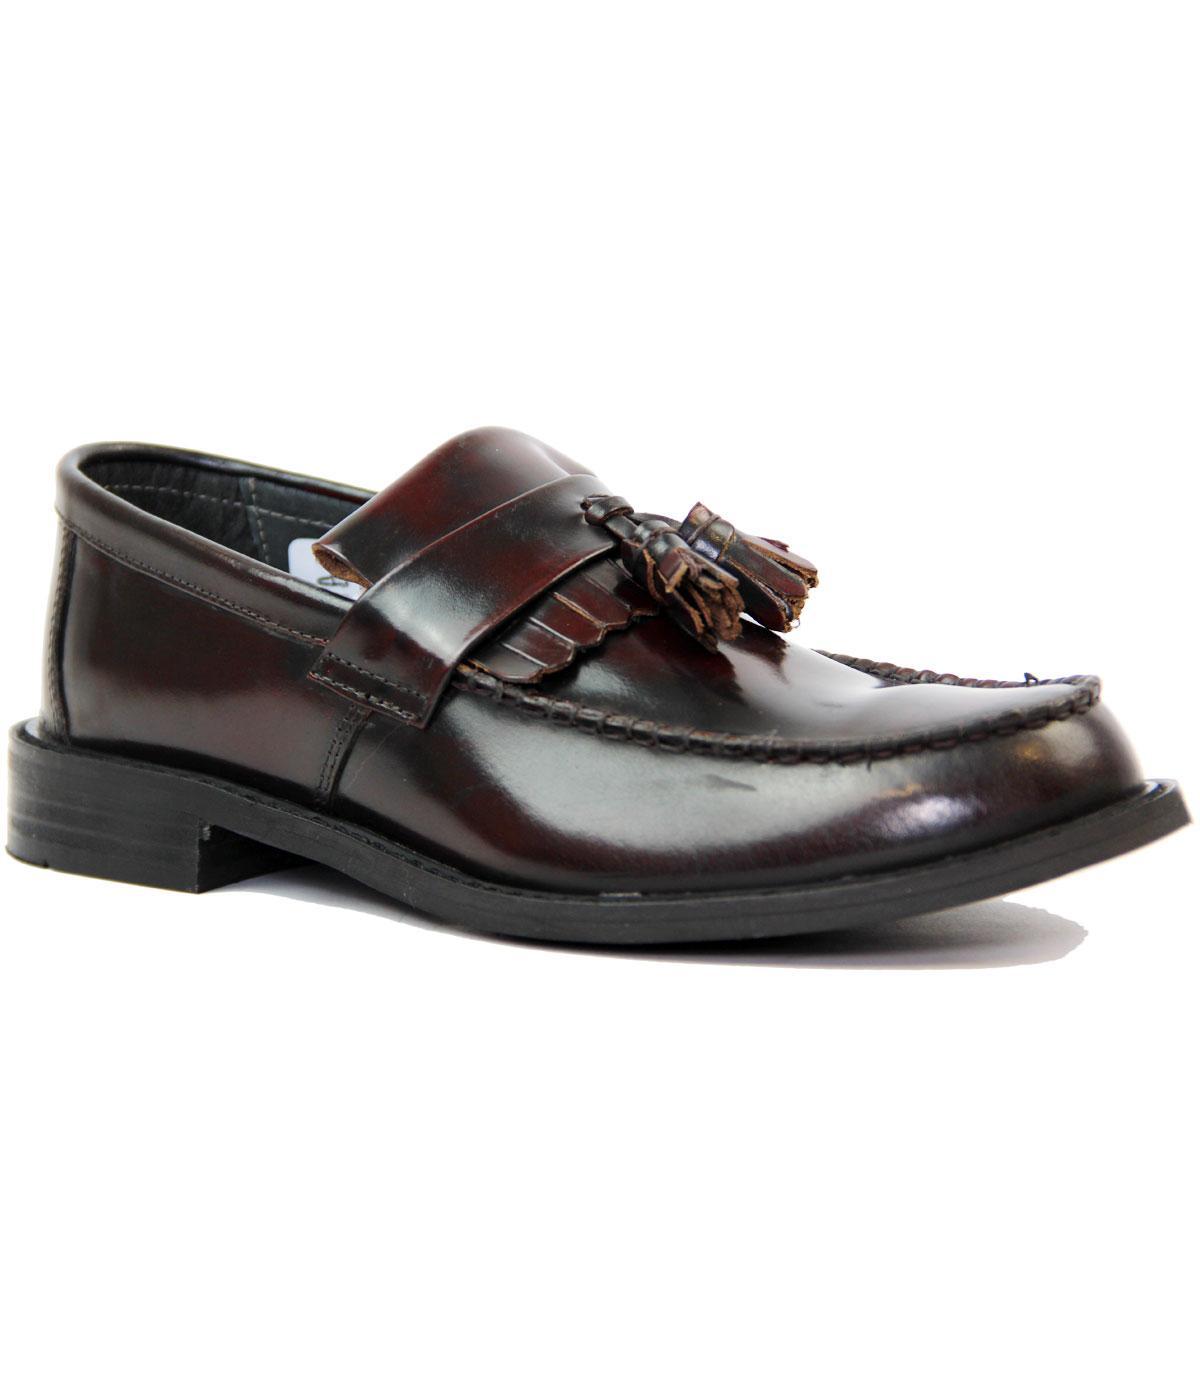 Retro Mod Tassel Fringe Leather Loafers (Oxblood)